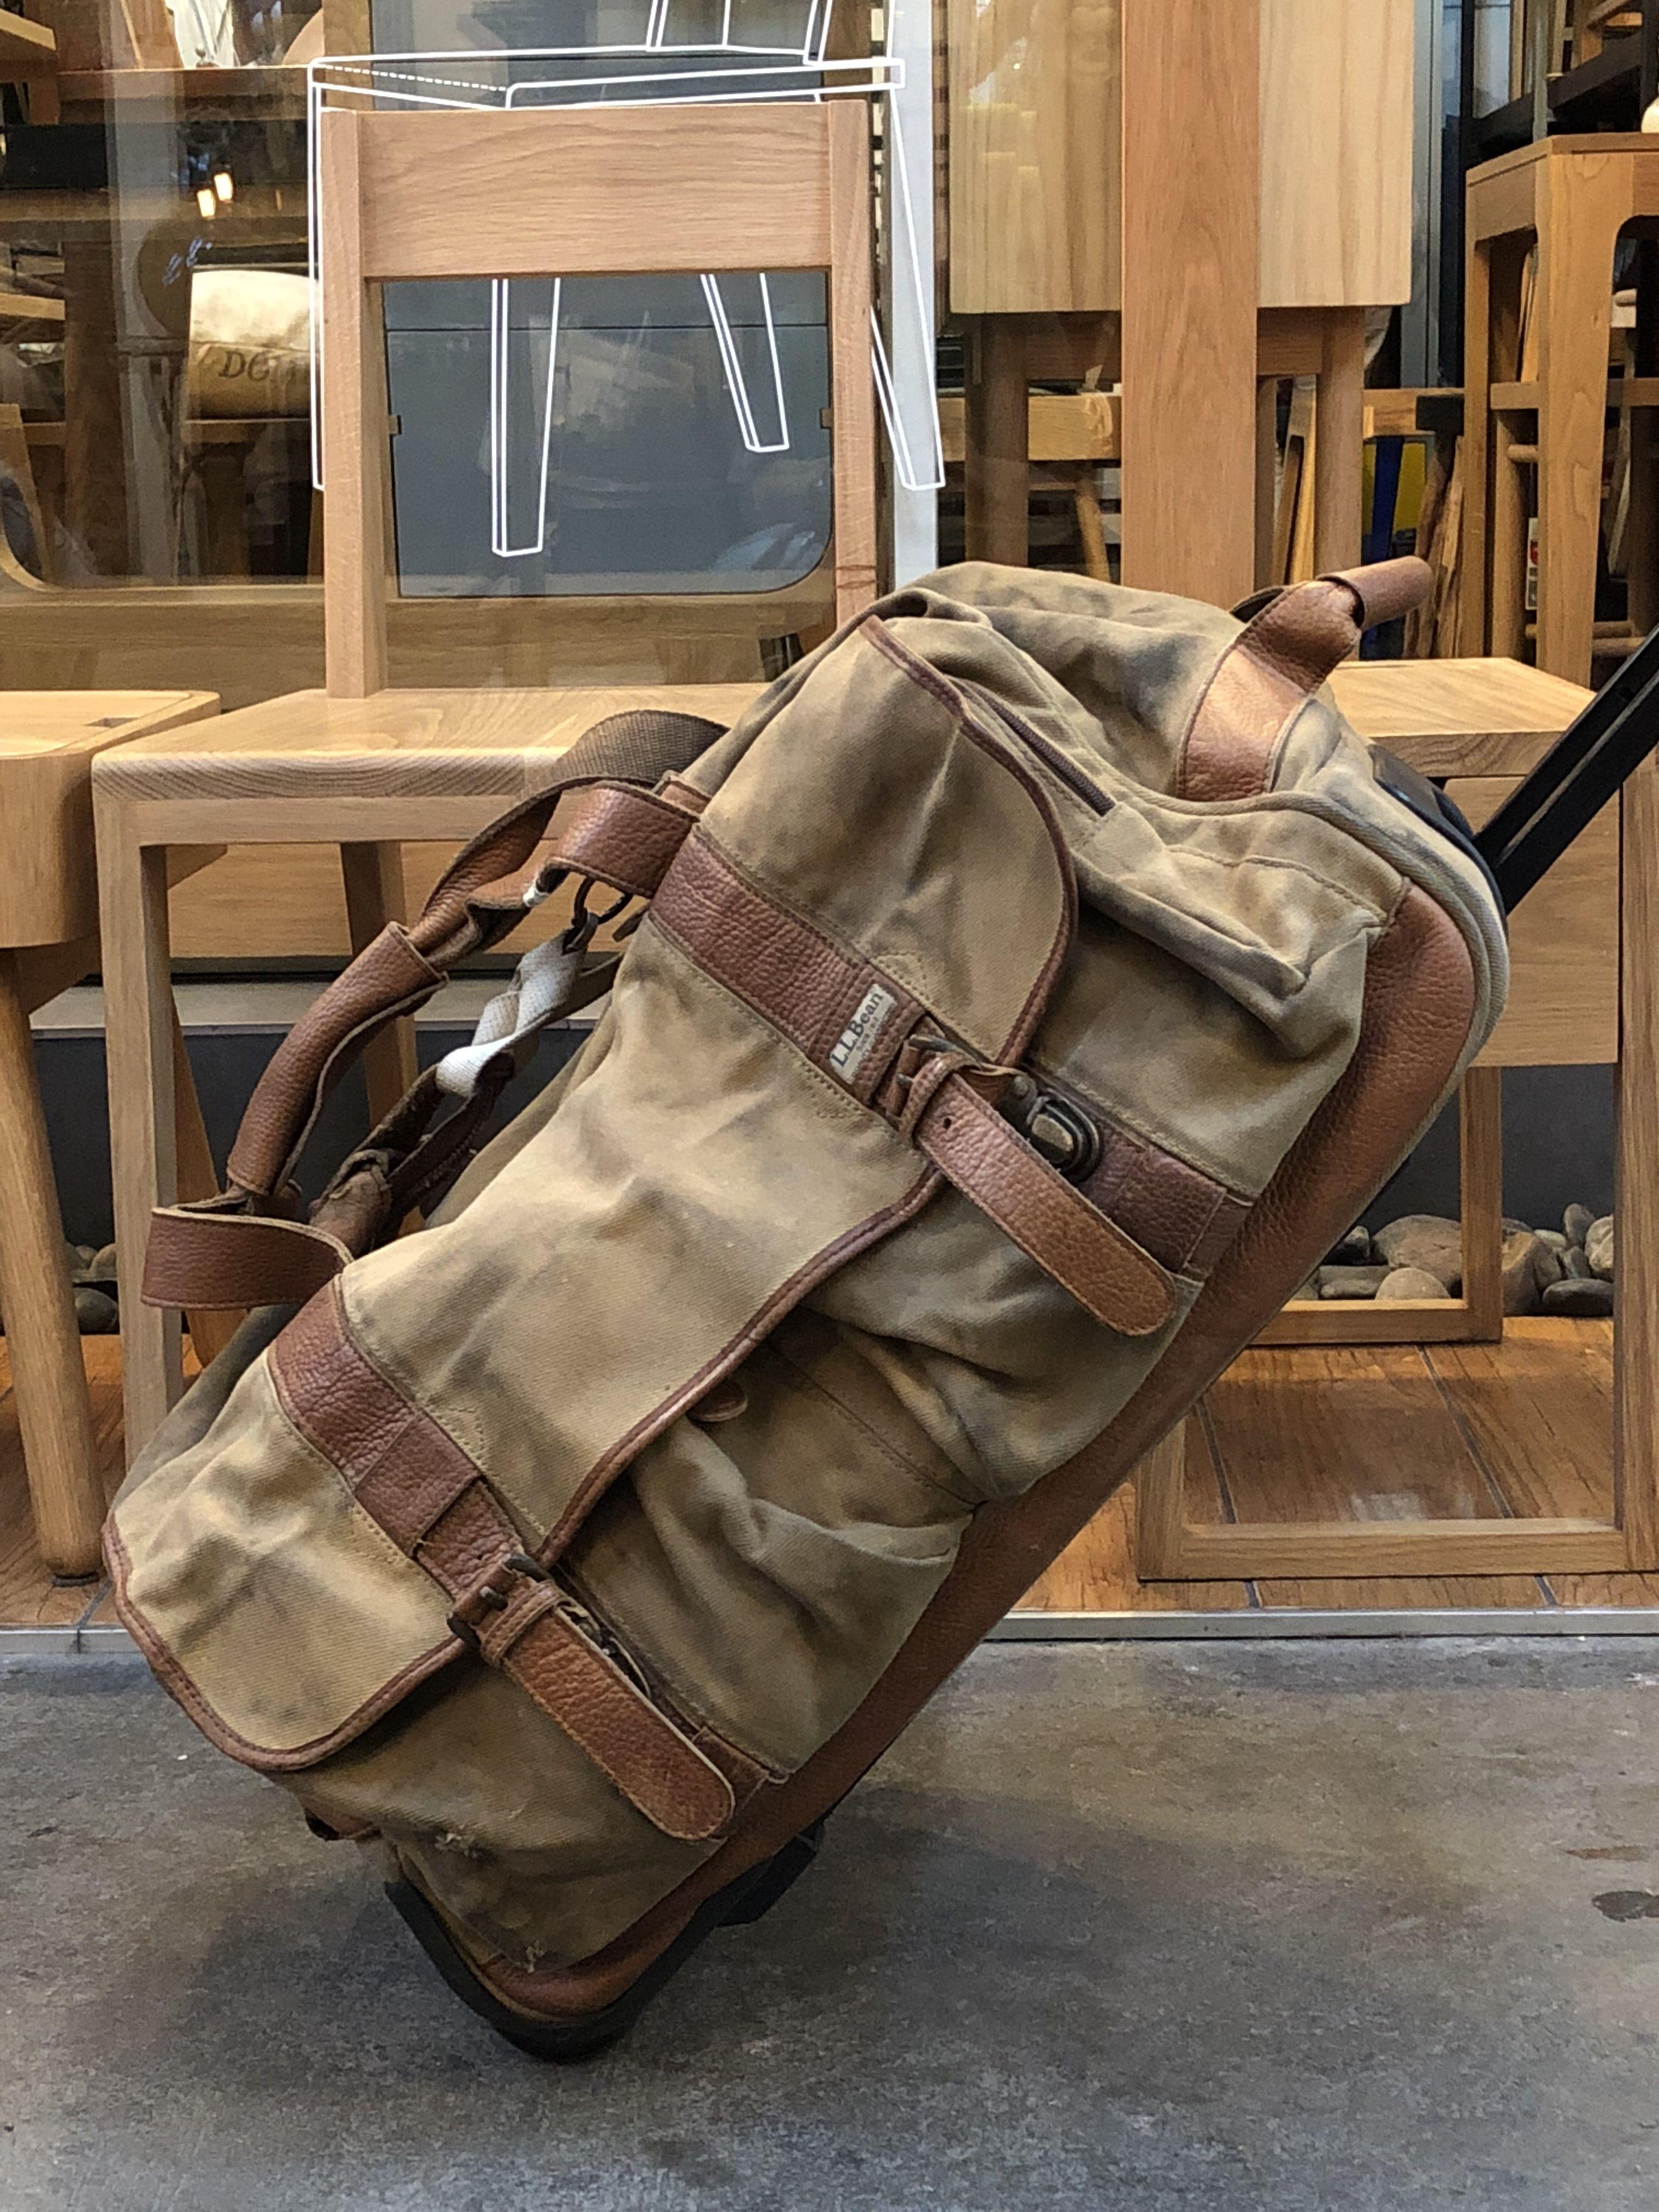 Vintage L L Bean Luggage Dorozhnye Sumki Sumki